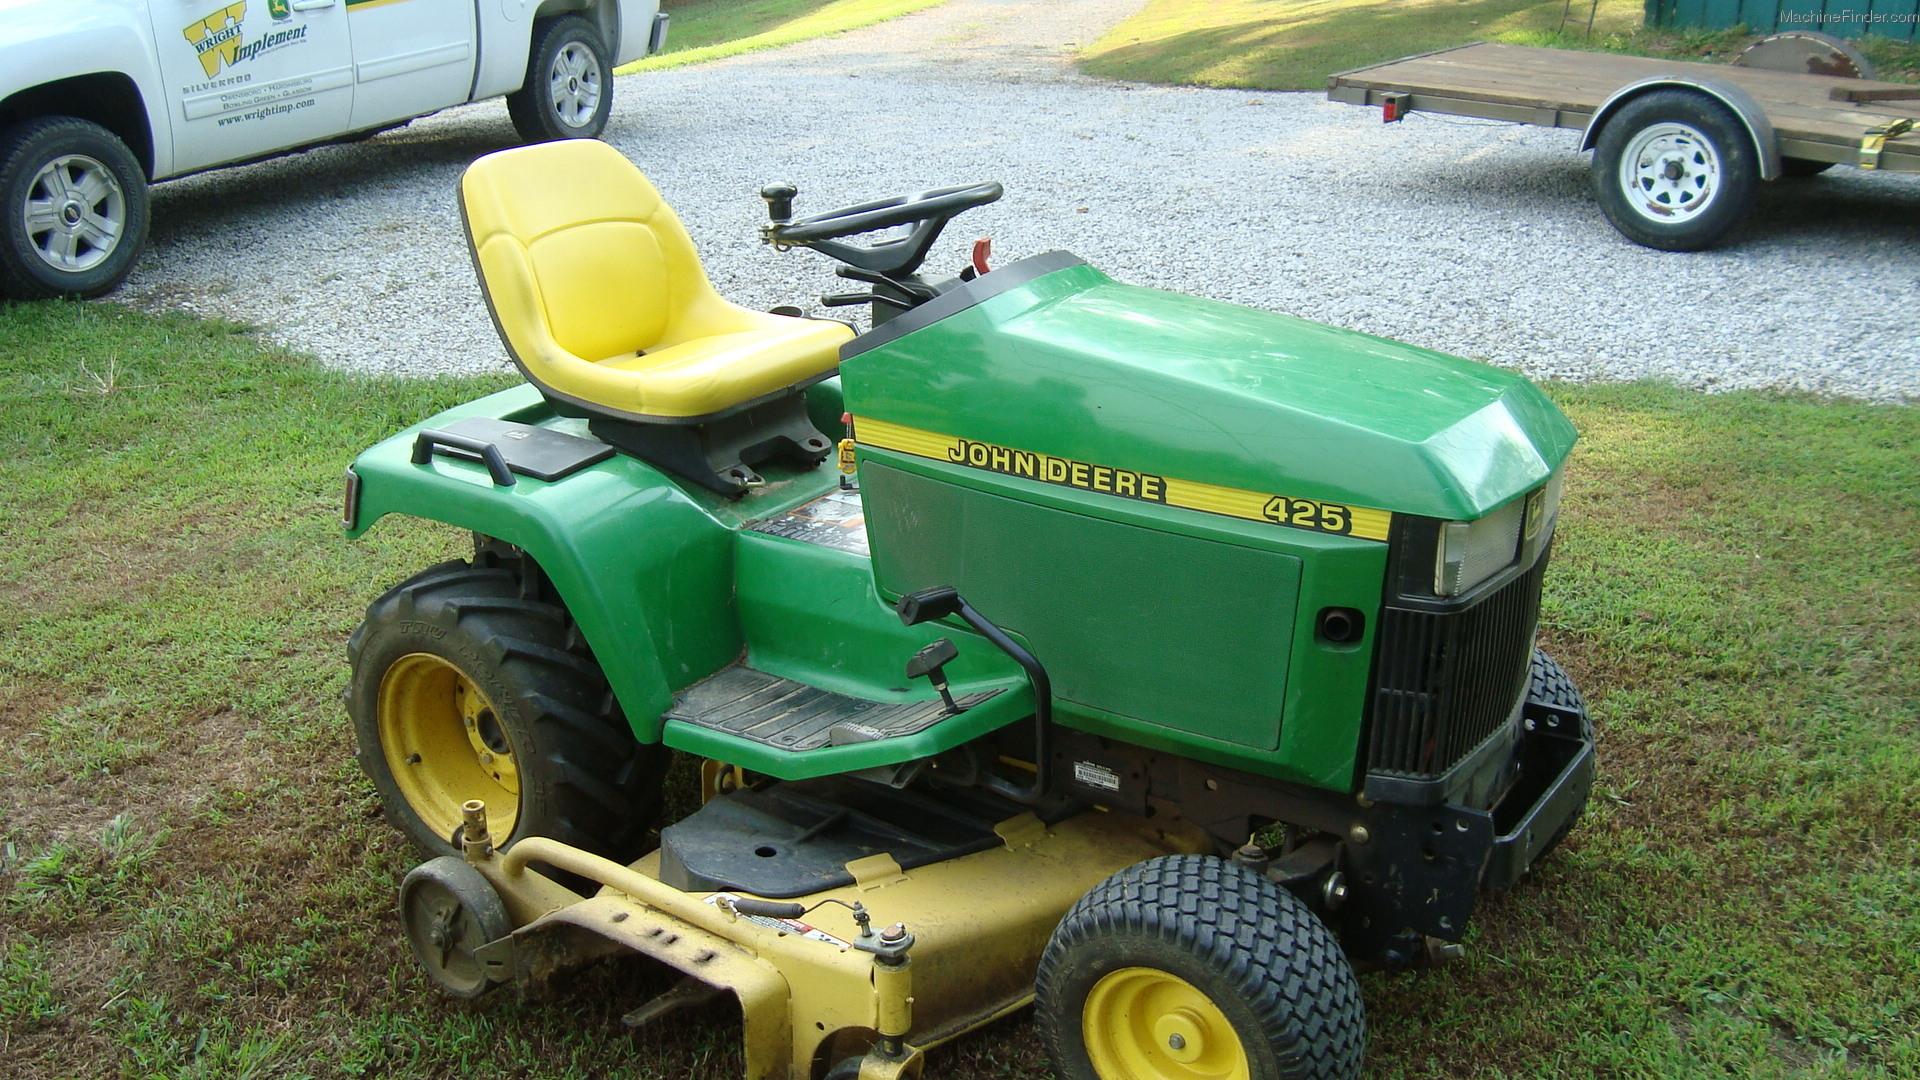 2001 John Deere 425 Lawn & Garden and Commercial Mowing ...